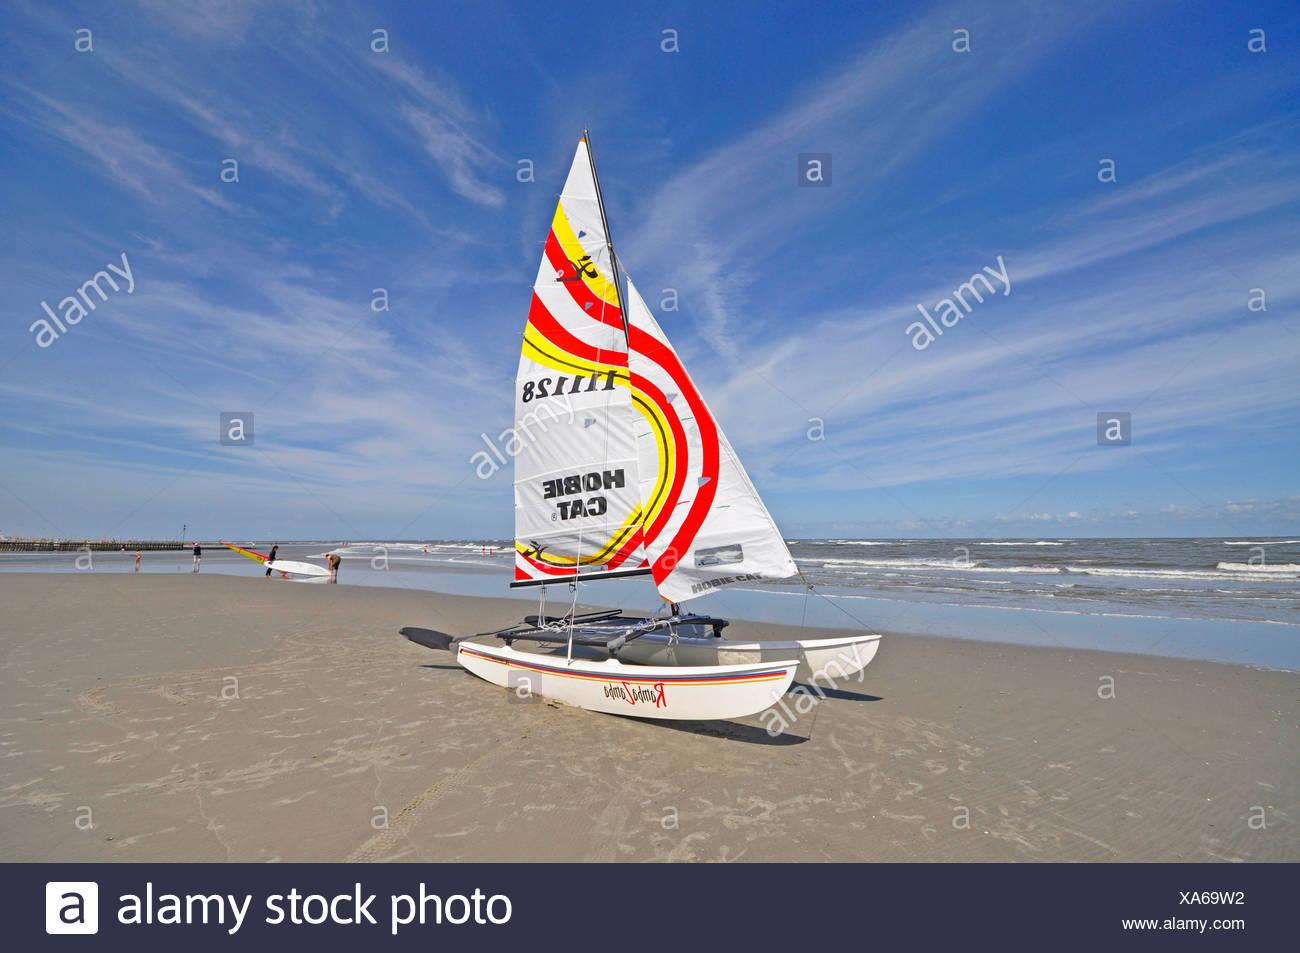 catamaran on the sand beach, Germany, Lower Saxony, East Frisia Stock Photo